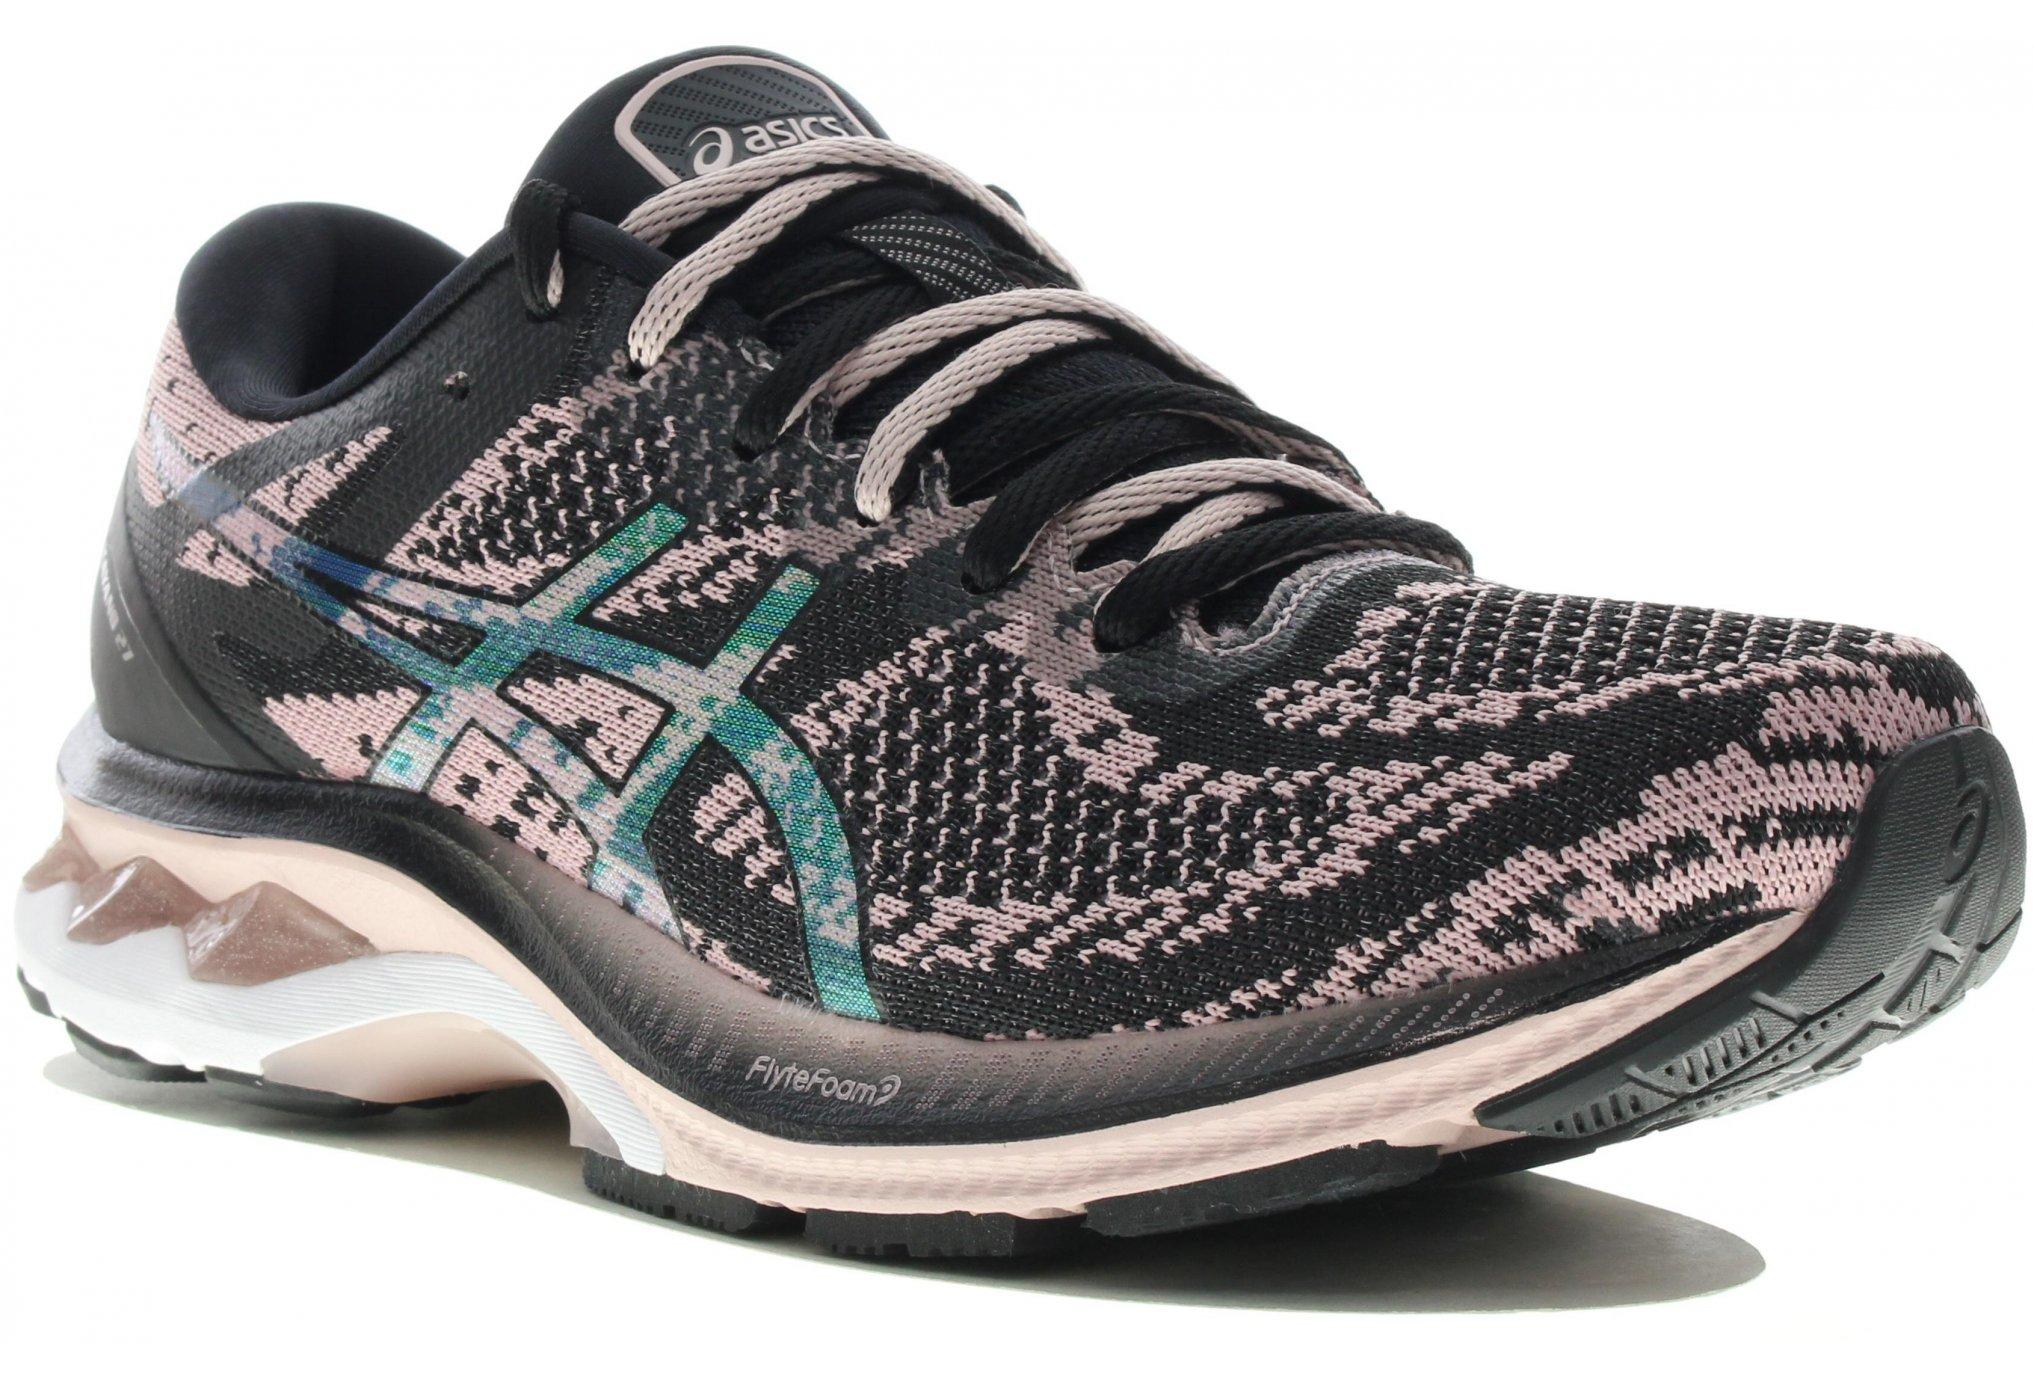 Asics Gel-Kayano 27 MK Chaussures running femme